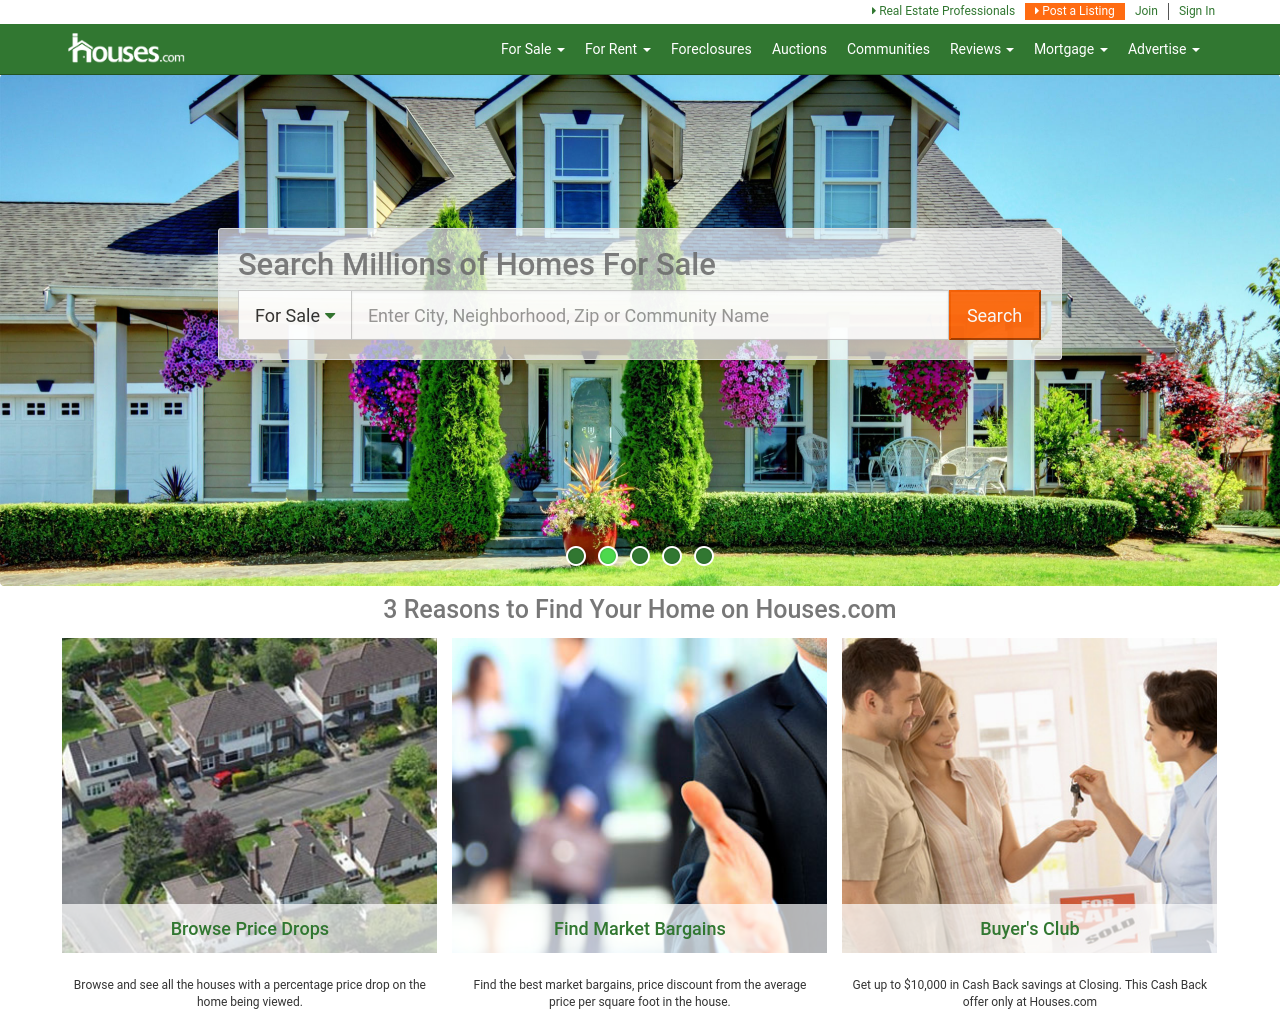 Houses.com-Advertising-Reviews-Pricing